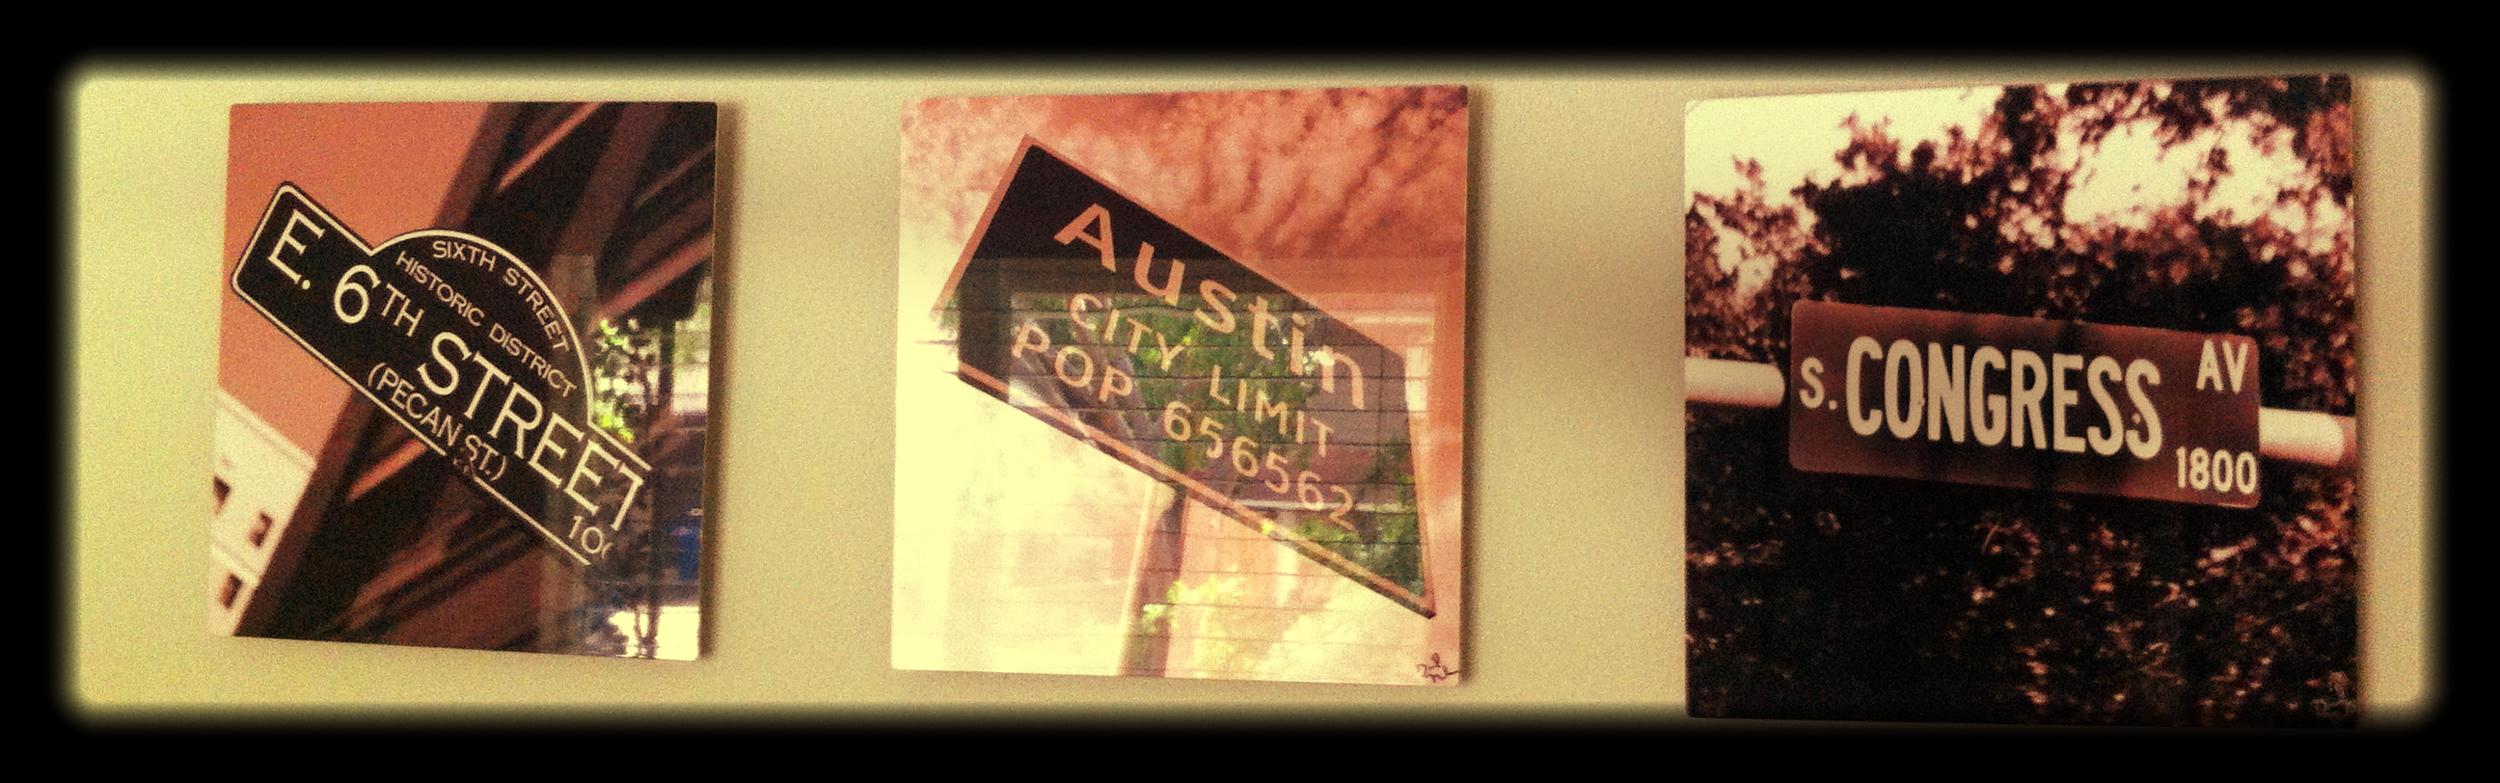 Austin sign art.